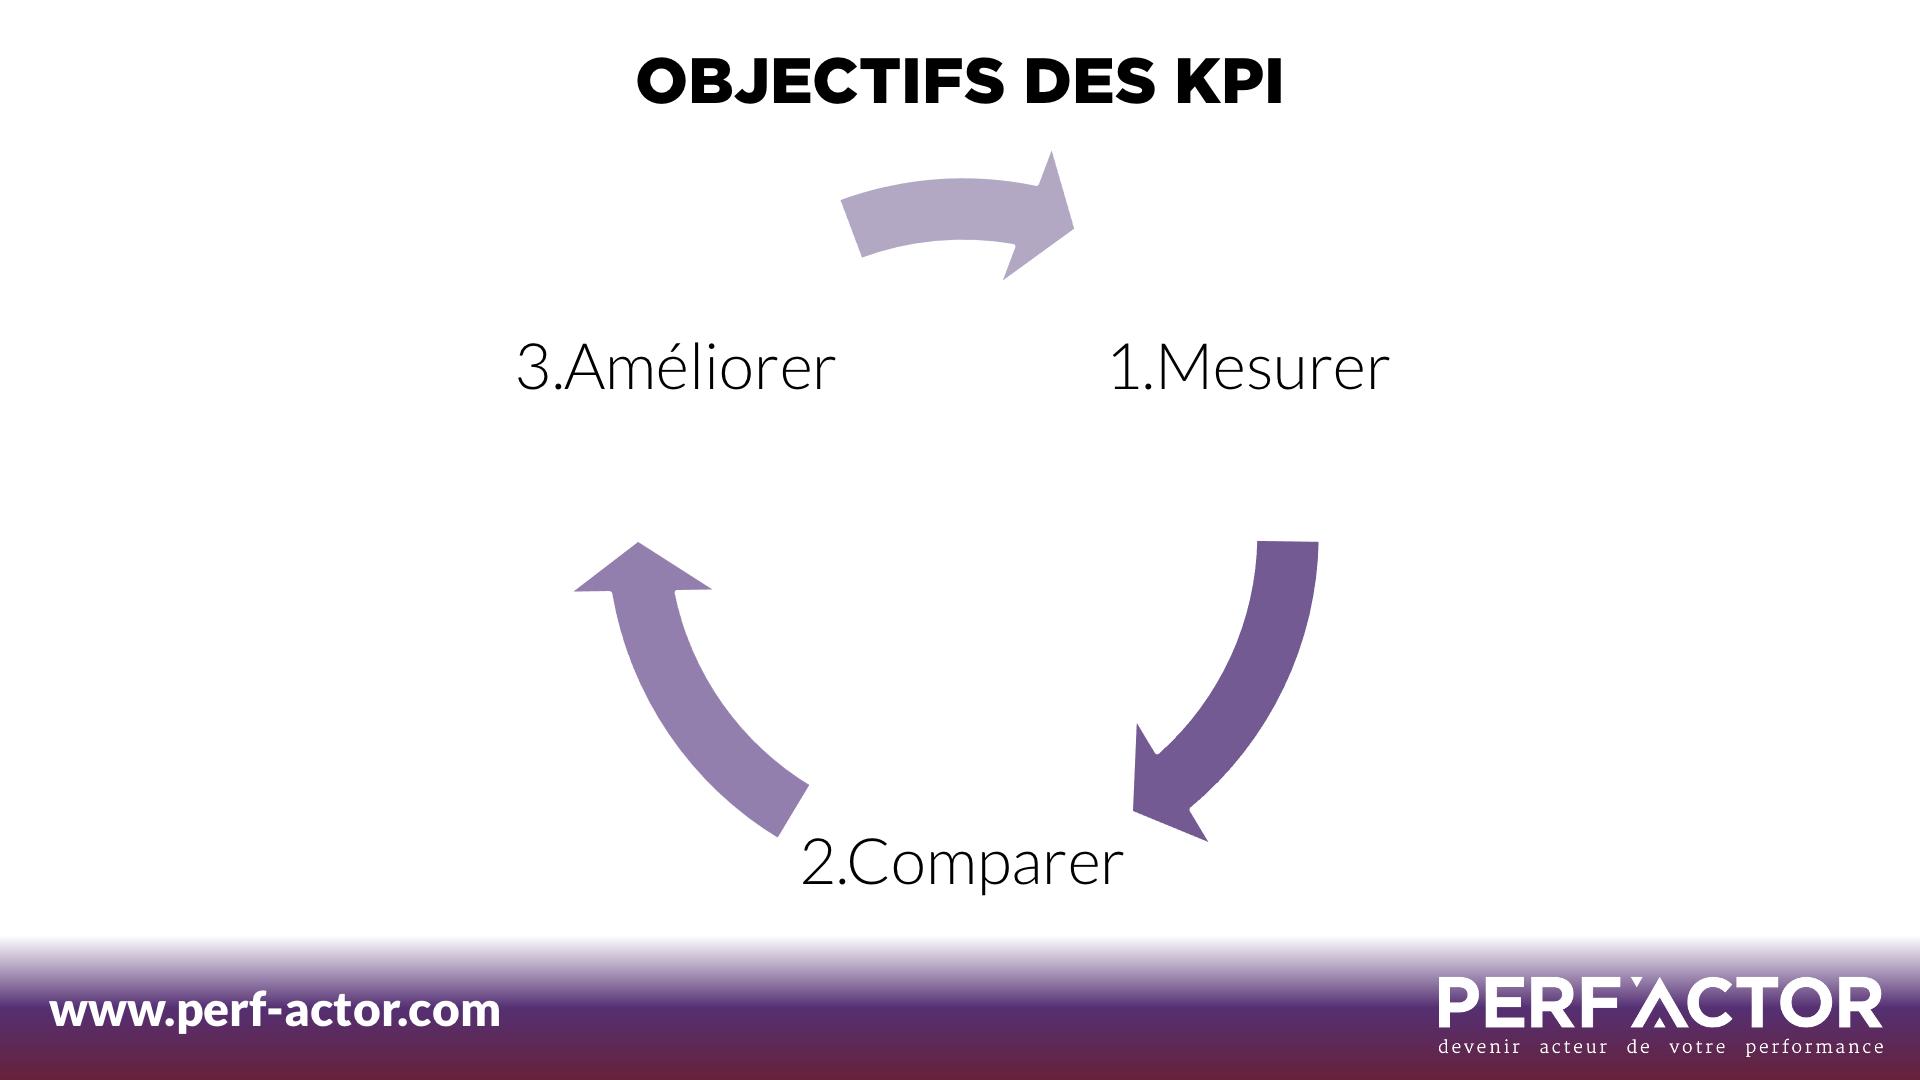 KPI-Performance-Mesurer-Améliorer-Comparer